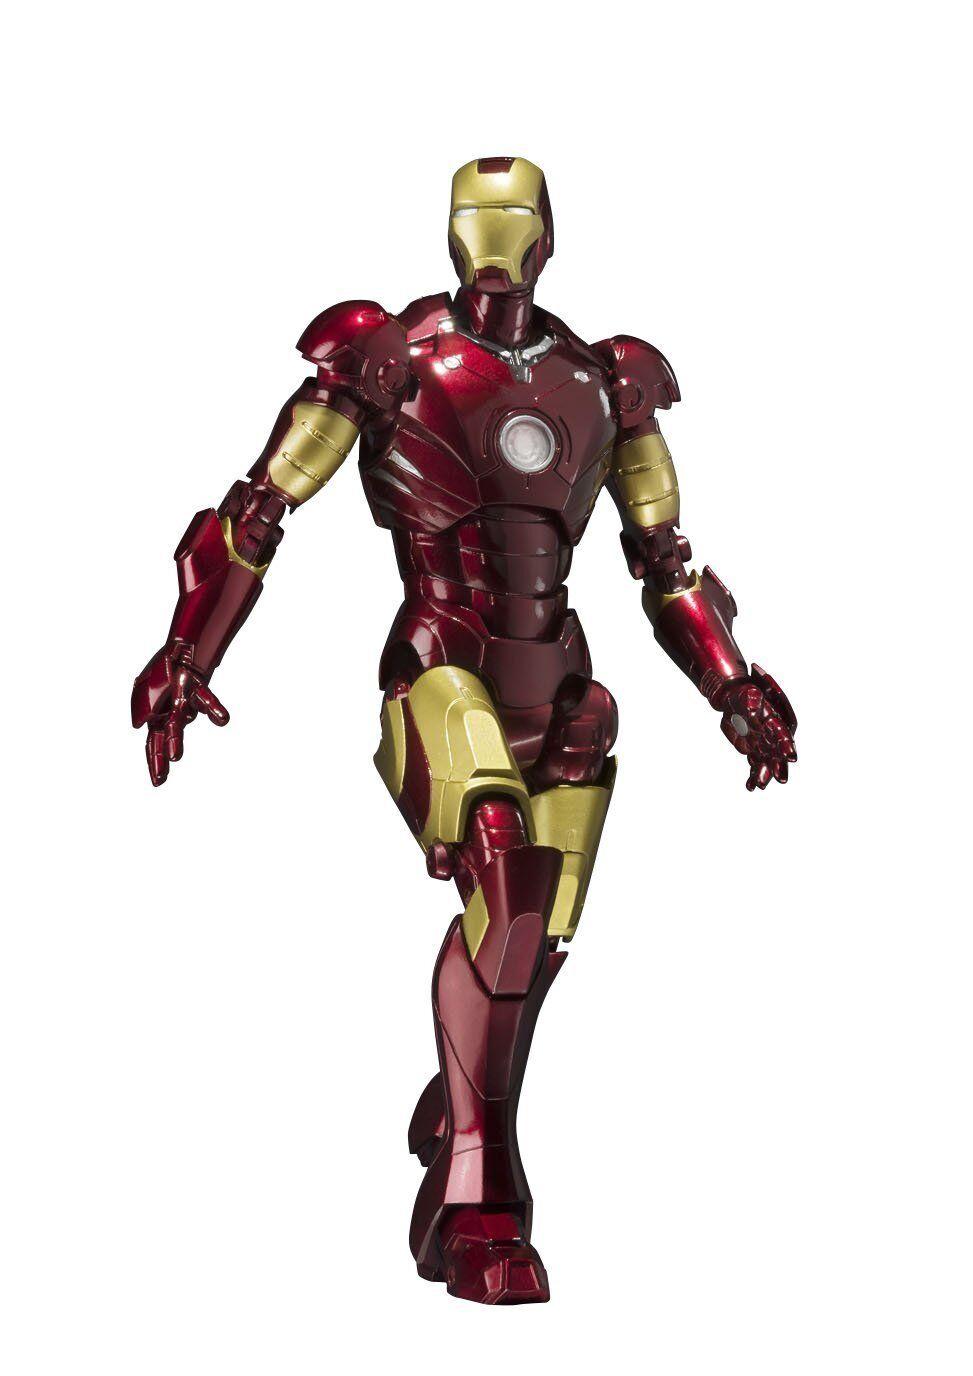 Bandai S.H.Figuarts Iron Man Mark 3 Japan version